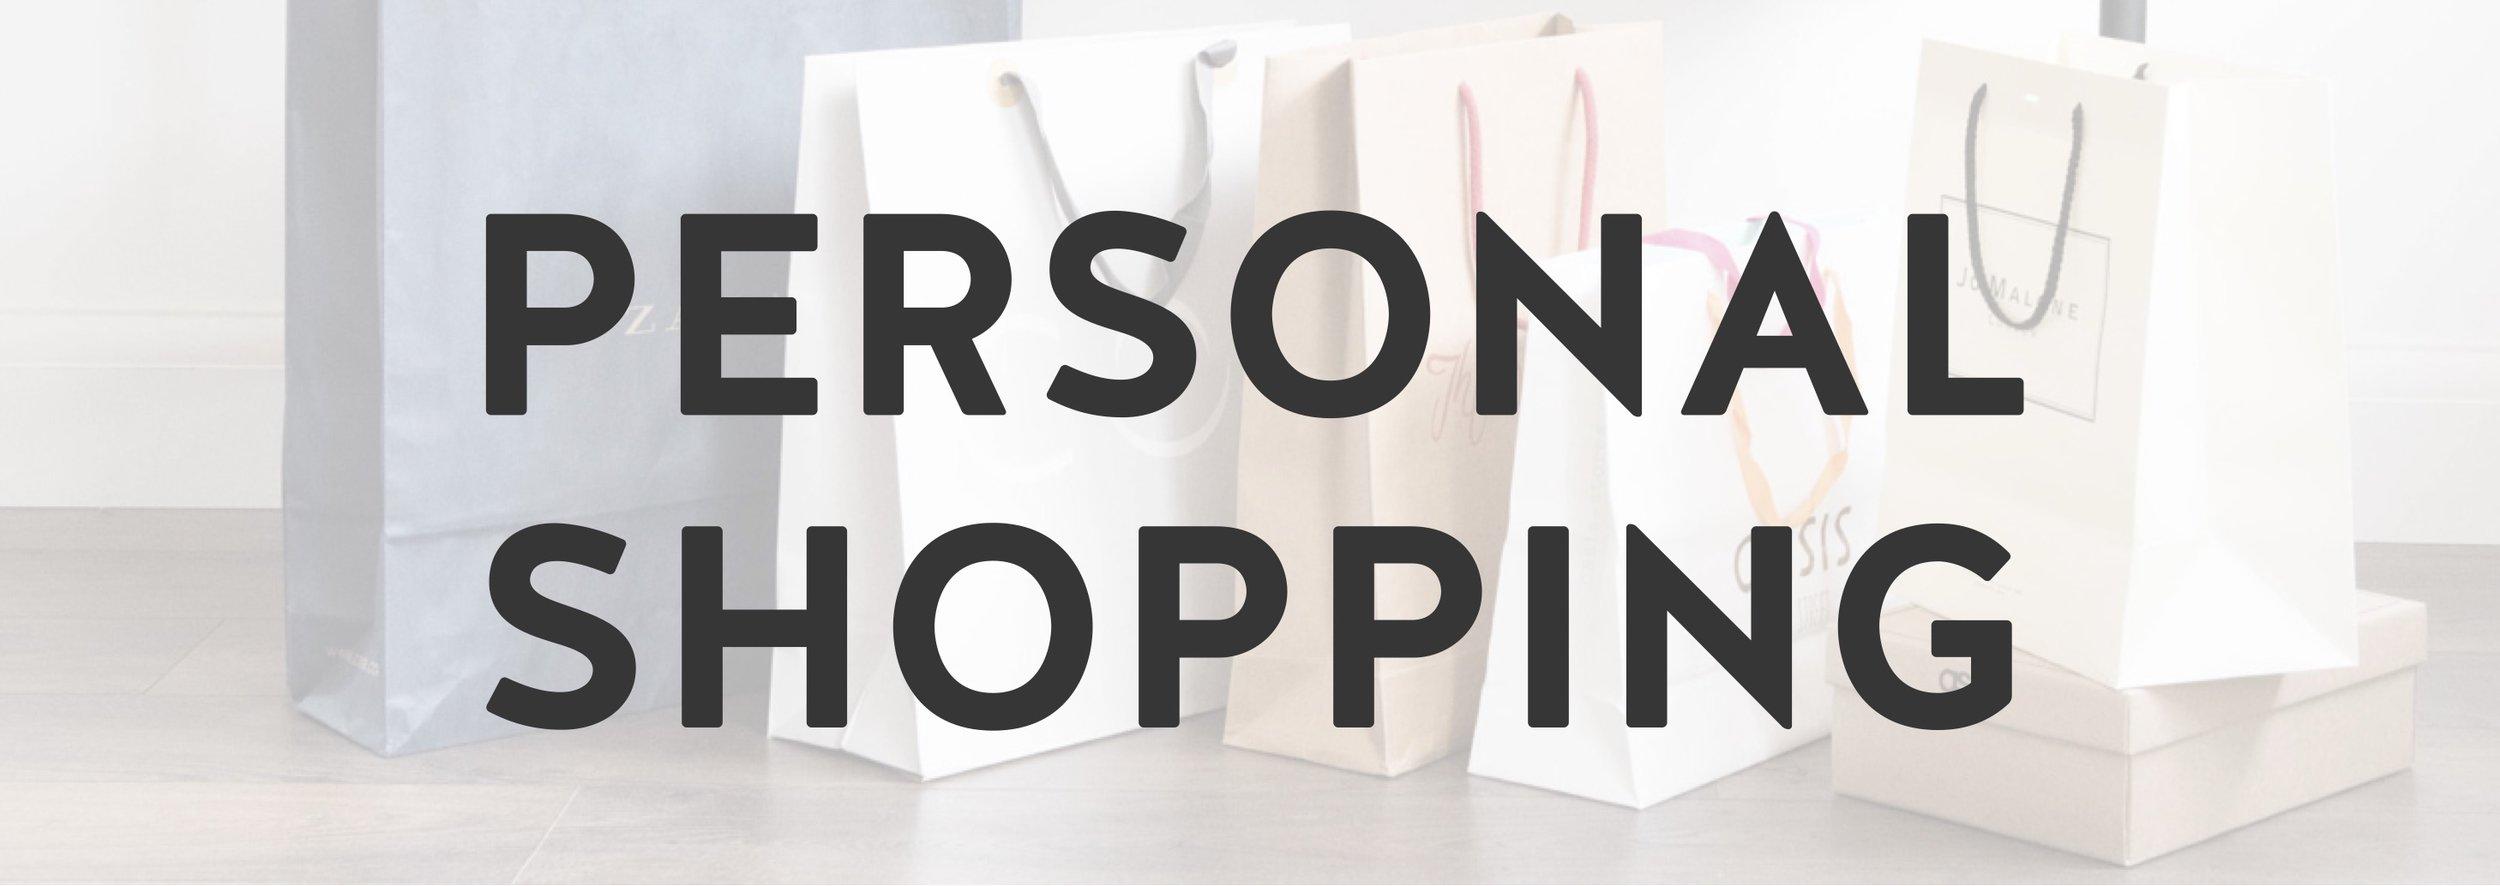 Personal shopping Hertfordshire